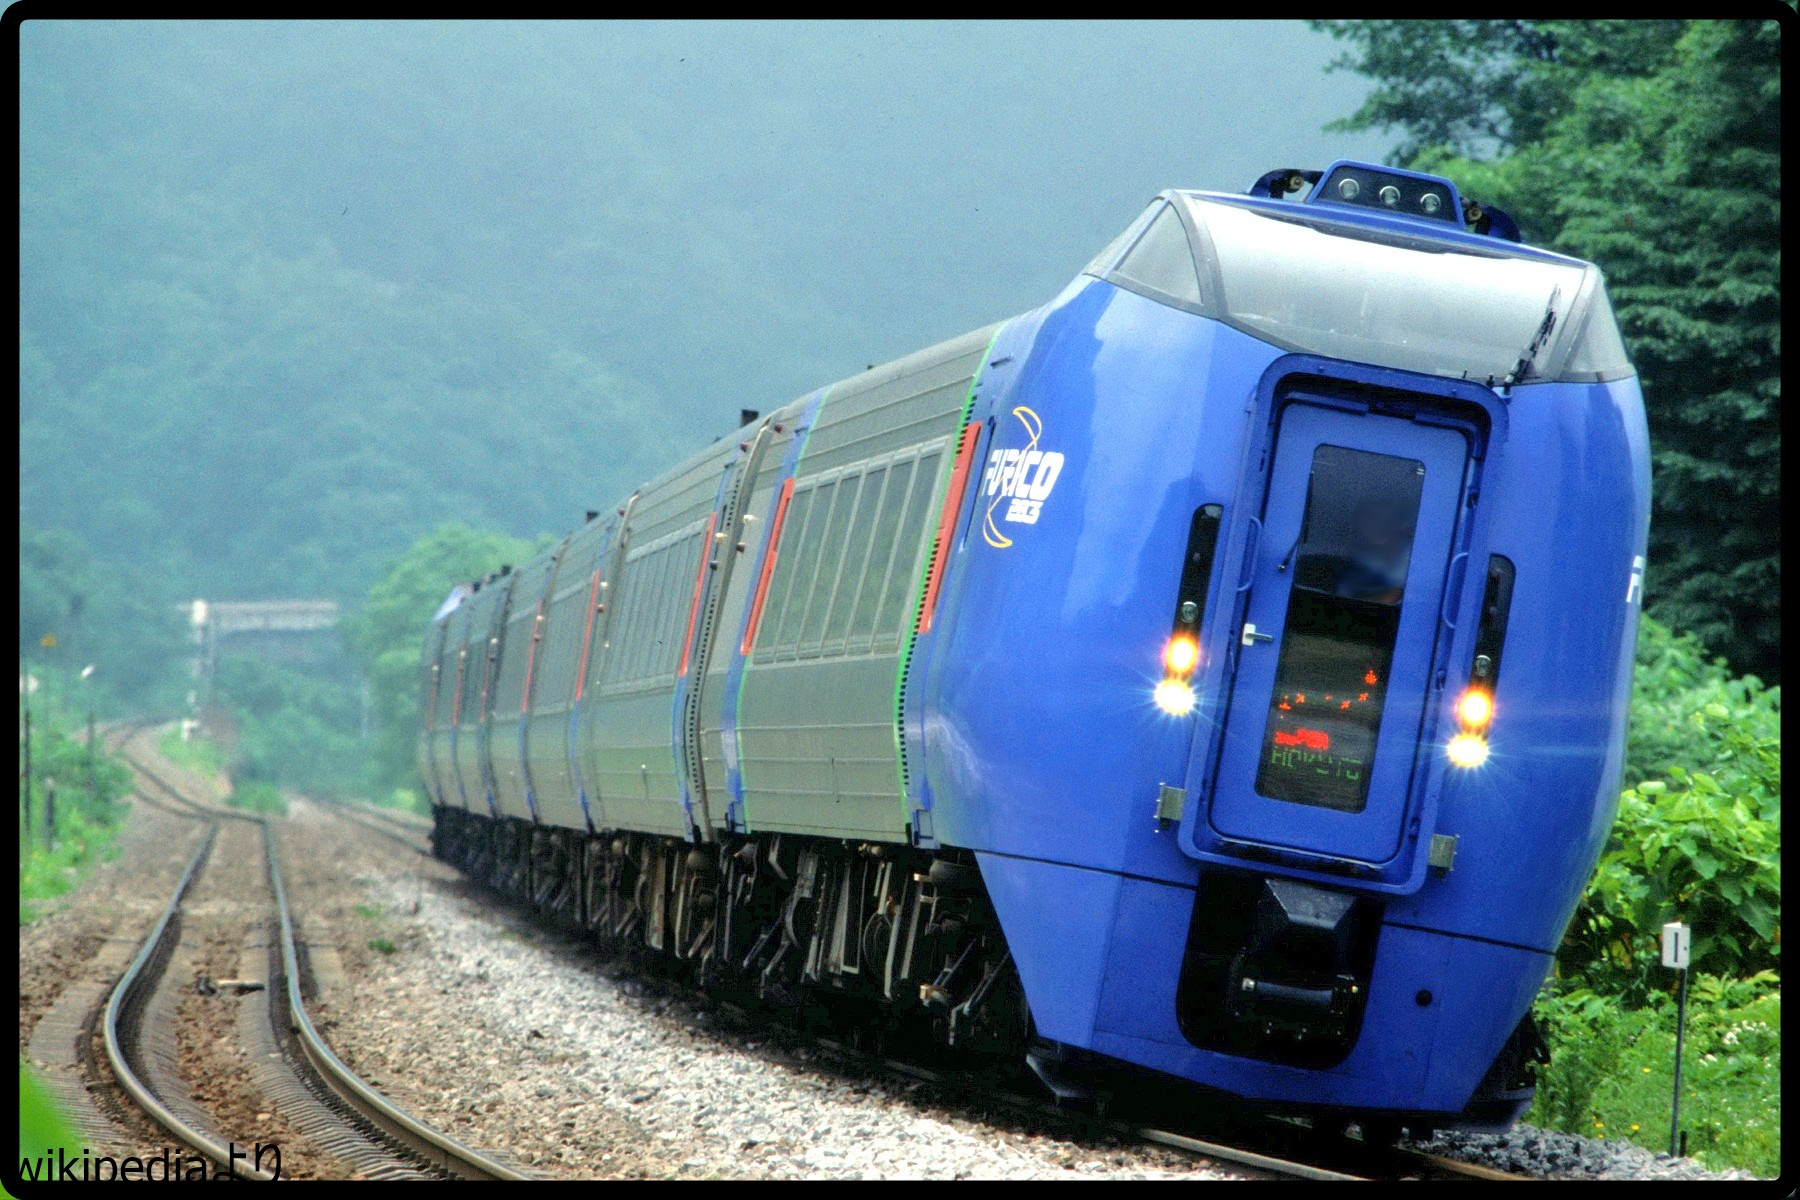 【JR北海道】2021年春ダイヤ改正ならぬ、「改悪」発表 減便・減車・廃止駅で年間5.5億円捻出へ